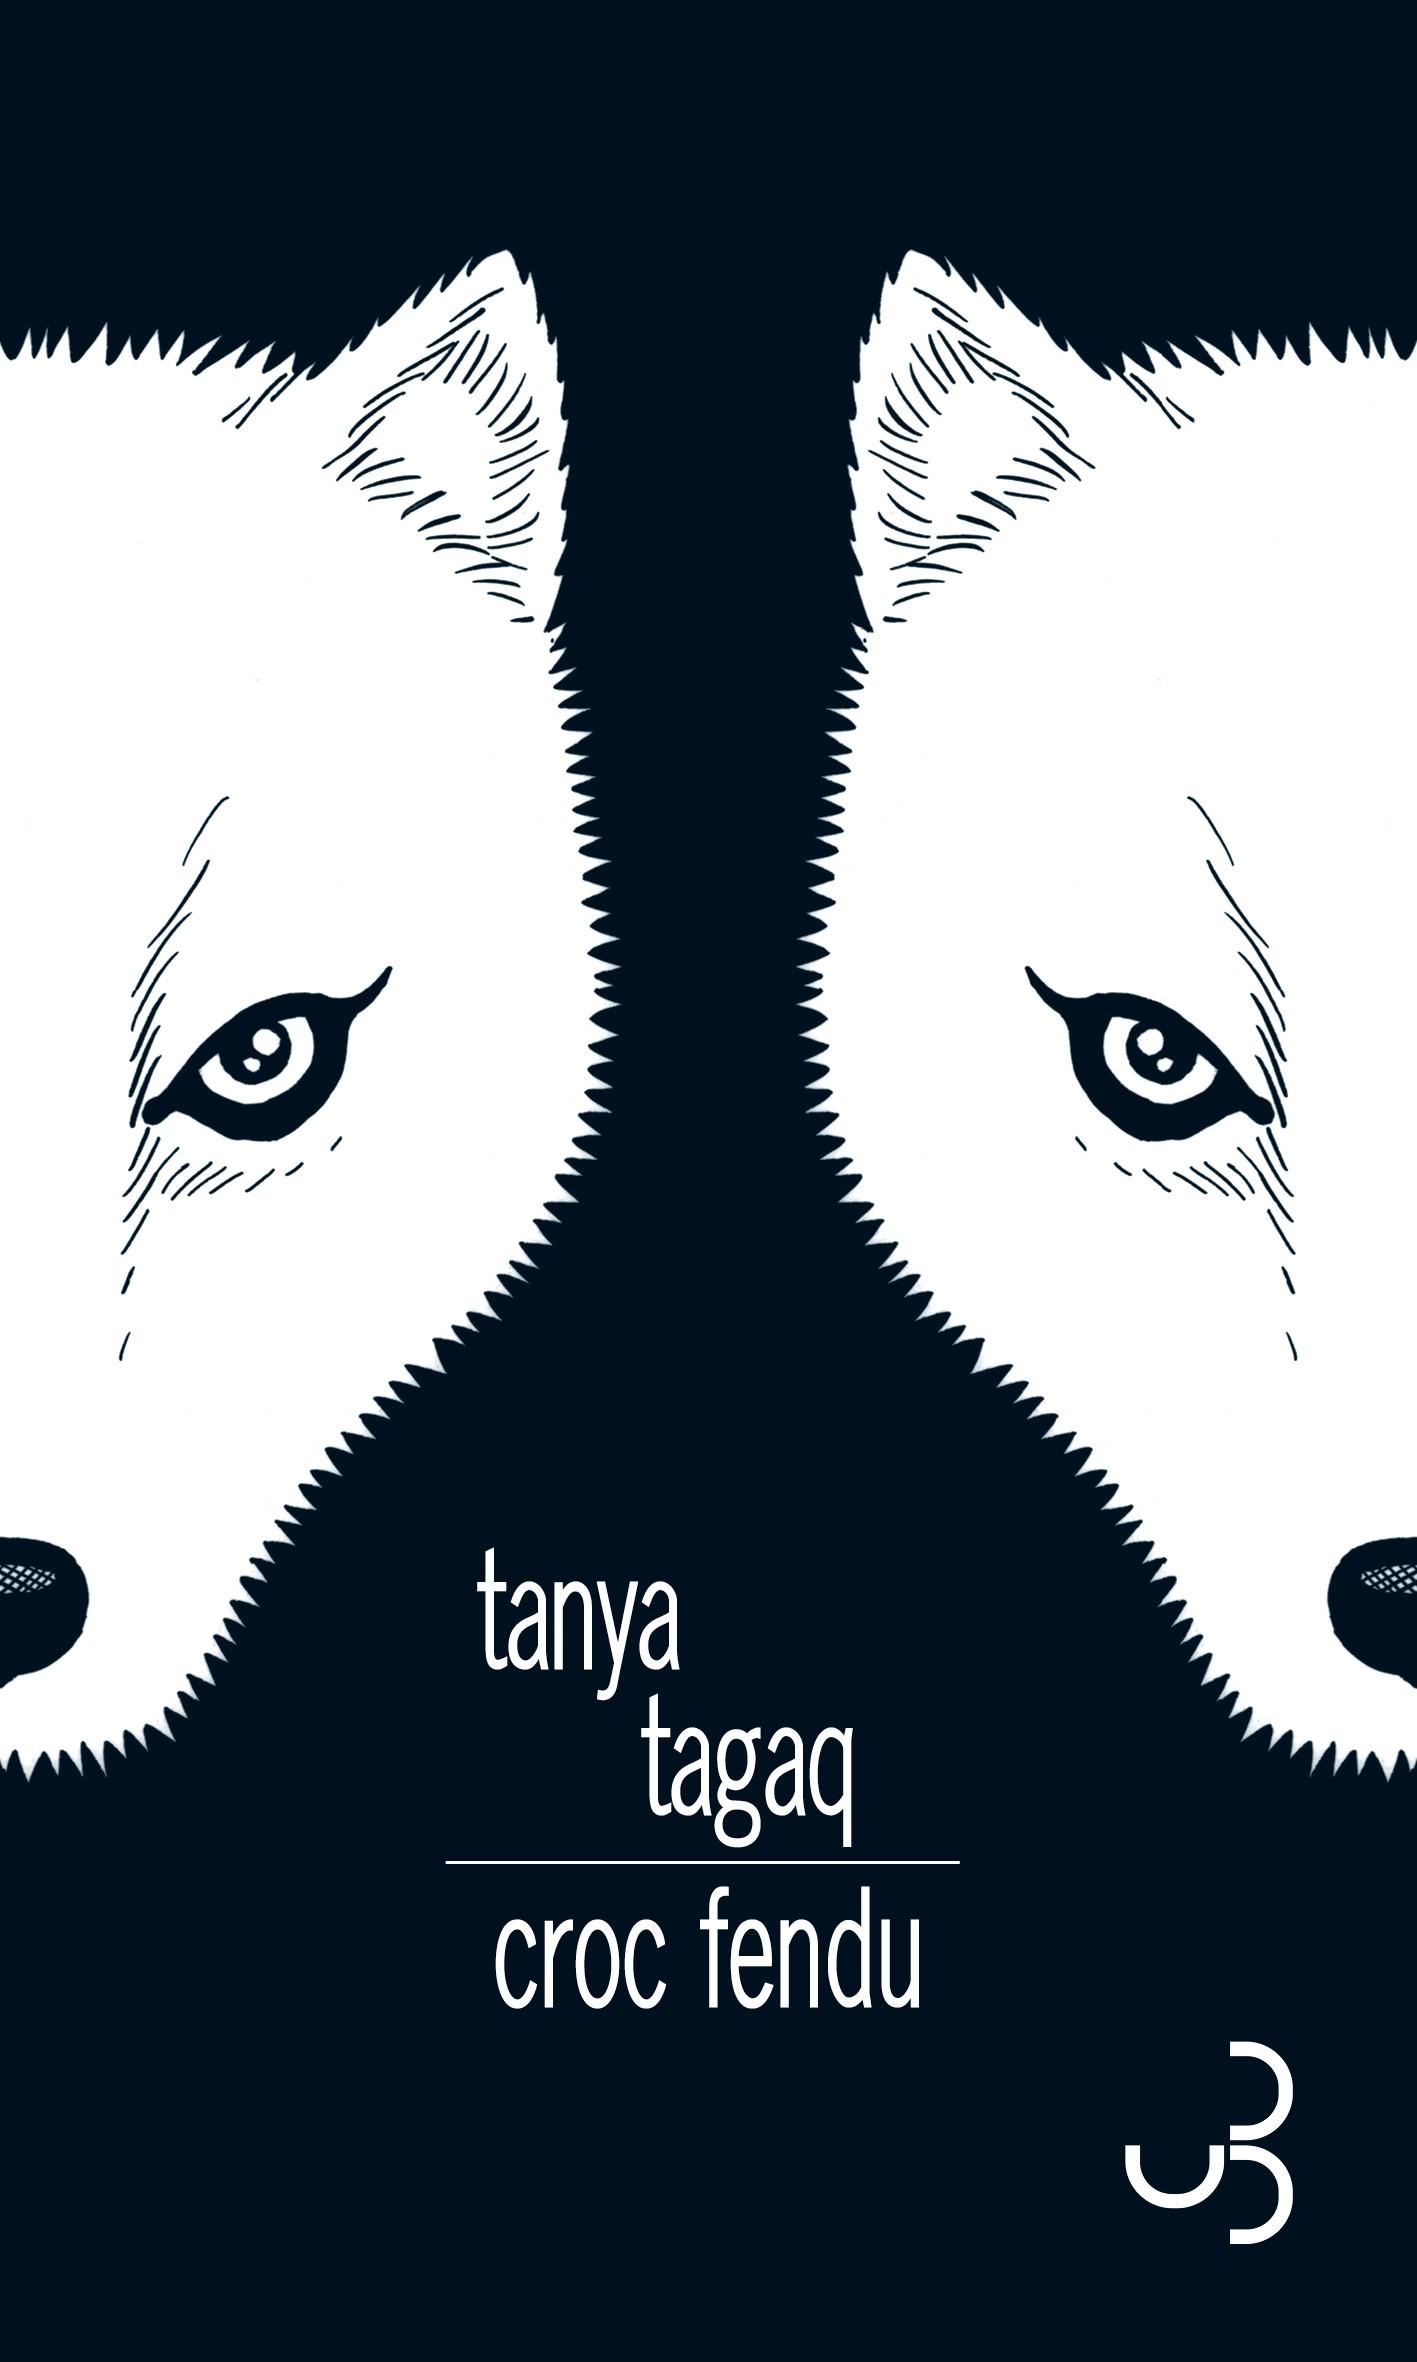 Tanya Tagaq, Croc fendu